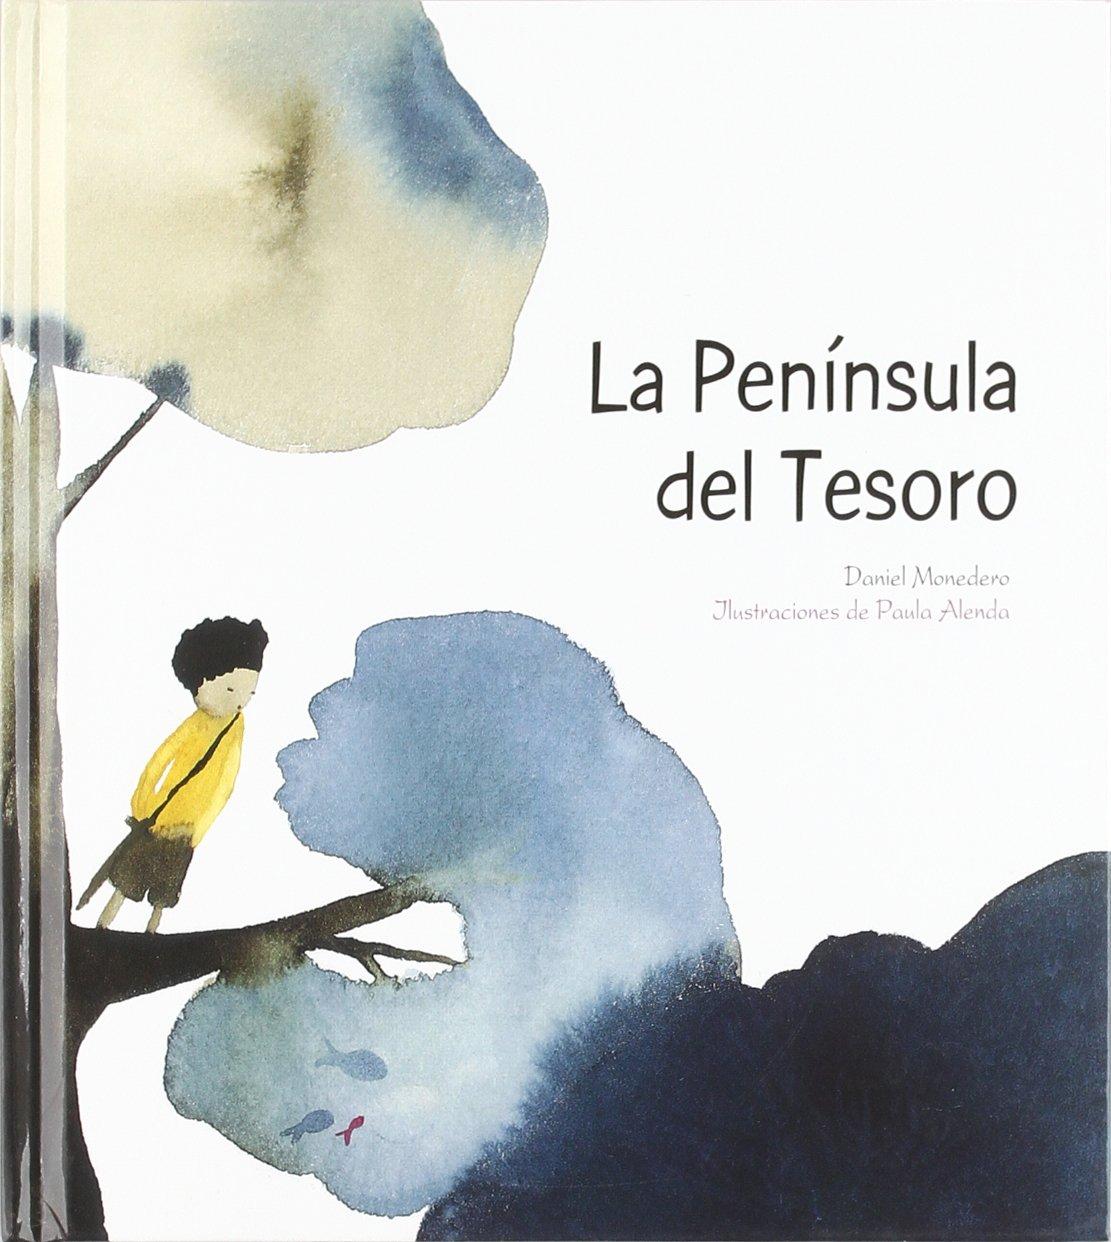 La Península del Tesoro: Daniel ; Alenda, Paula Monedero ...